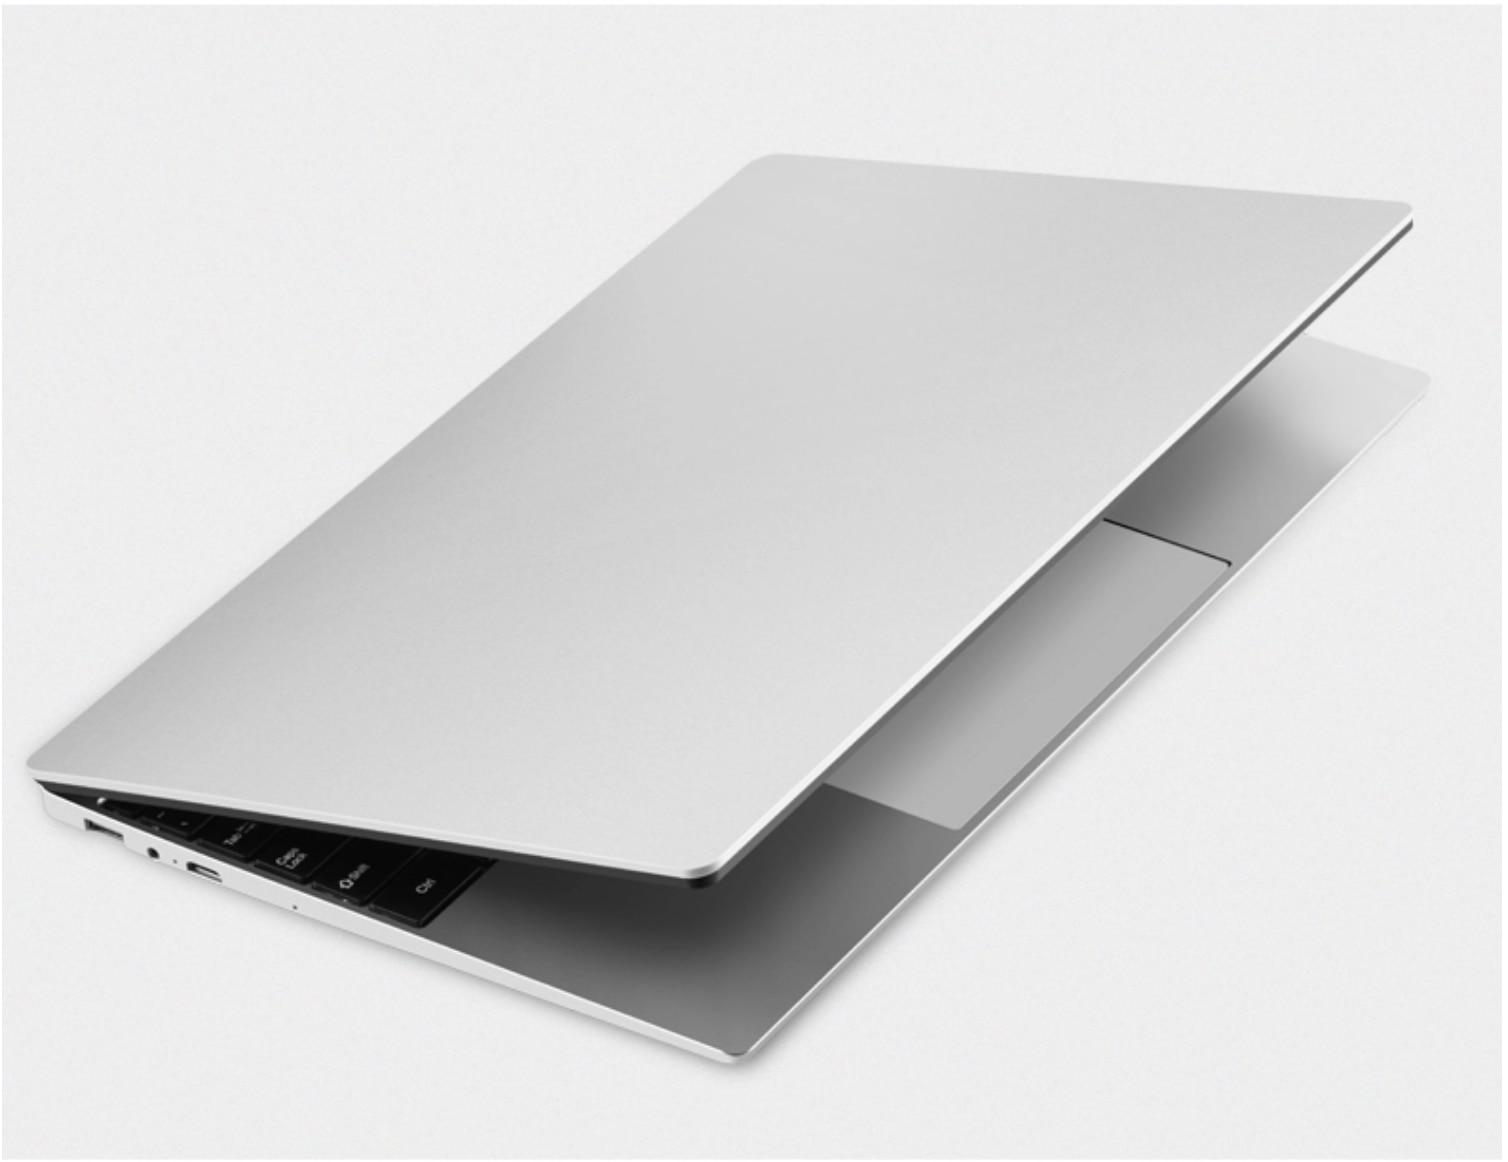 Air Laptop 13,3 pulgadas Mi Notebook pantalla IPS I5 8GB + 256GB